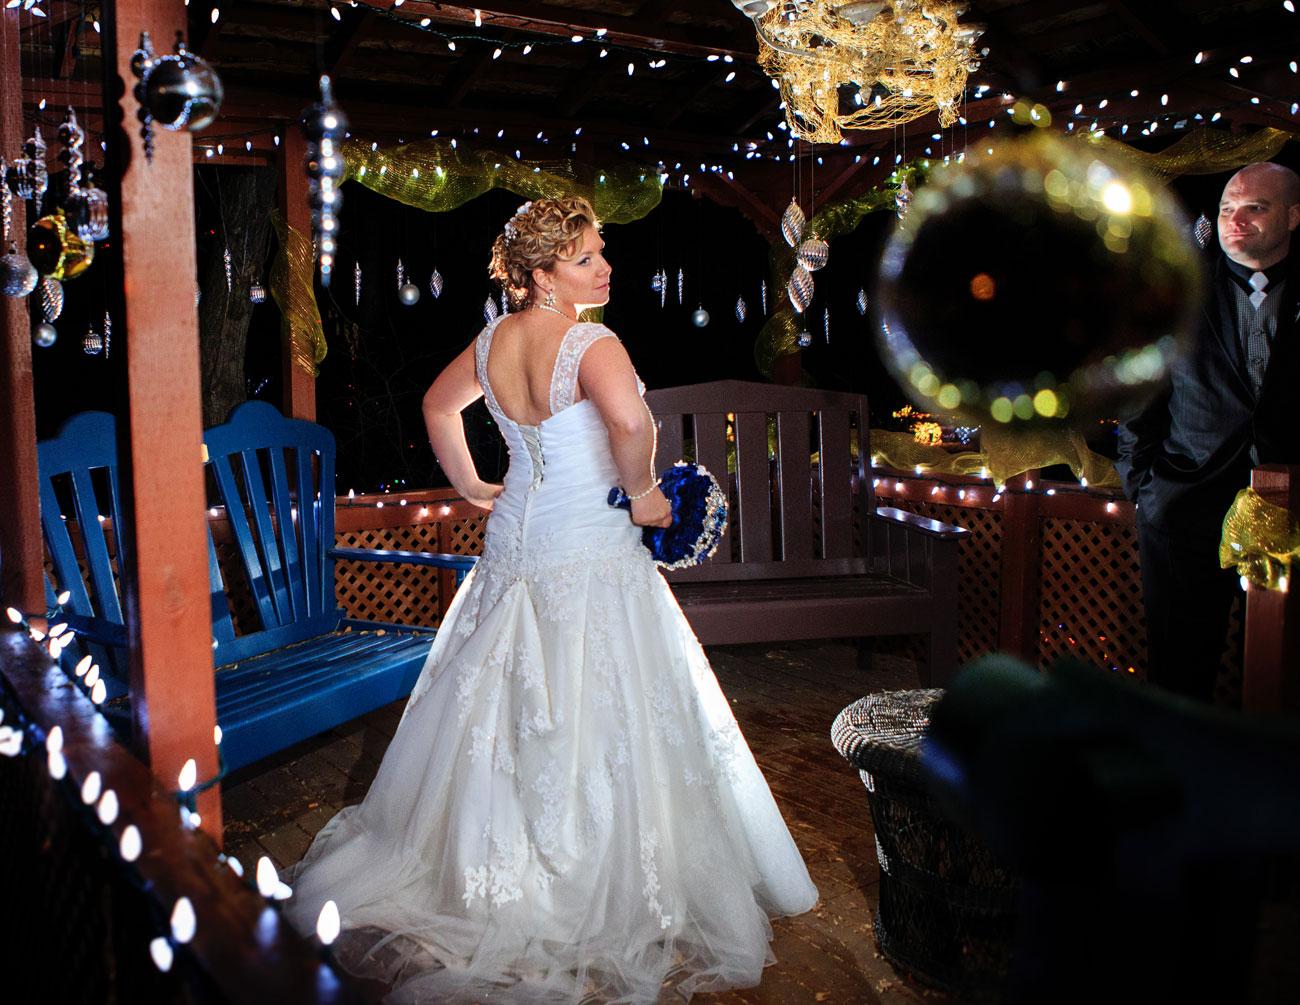 Courtney & Ryan - Christmas Wedding - Three Hills, Alberta - Wedding Photography (37)